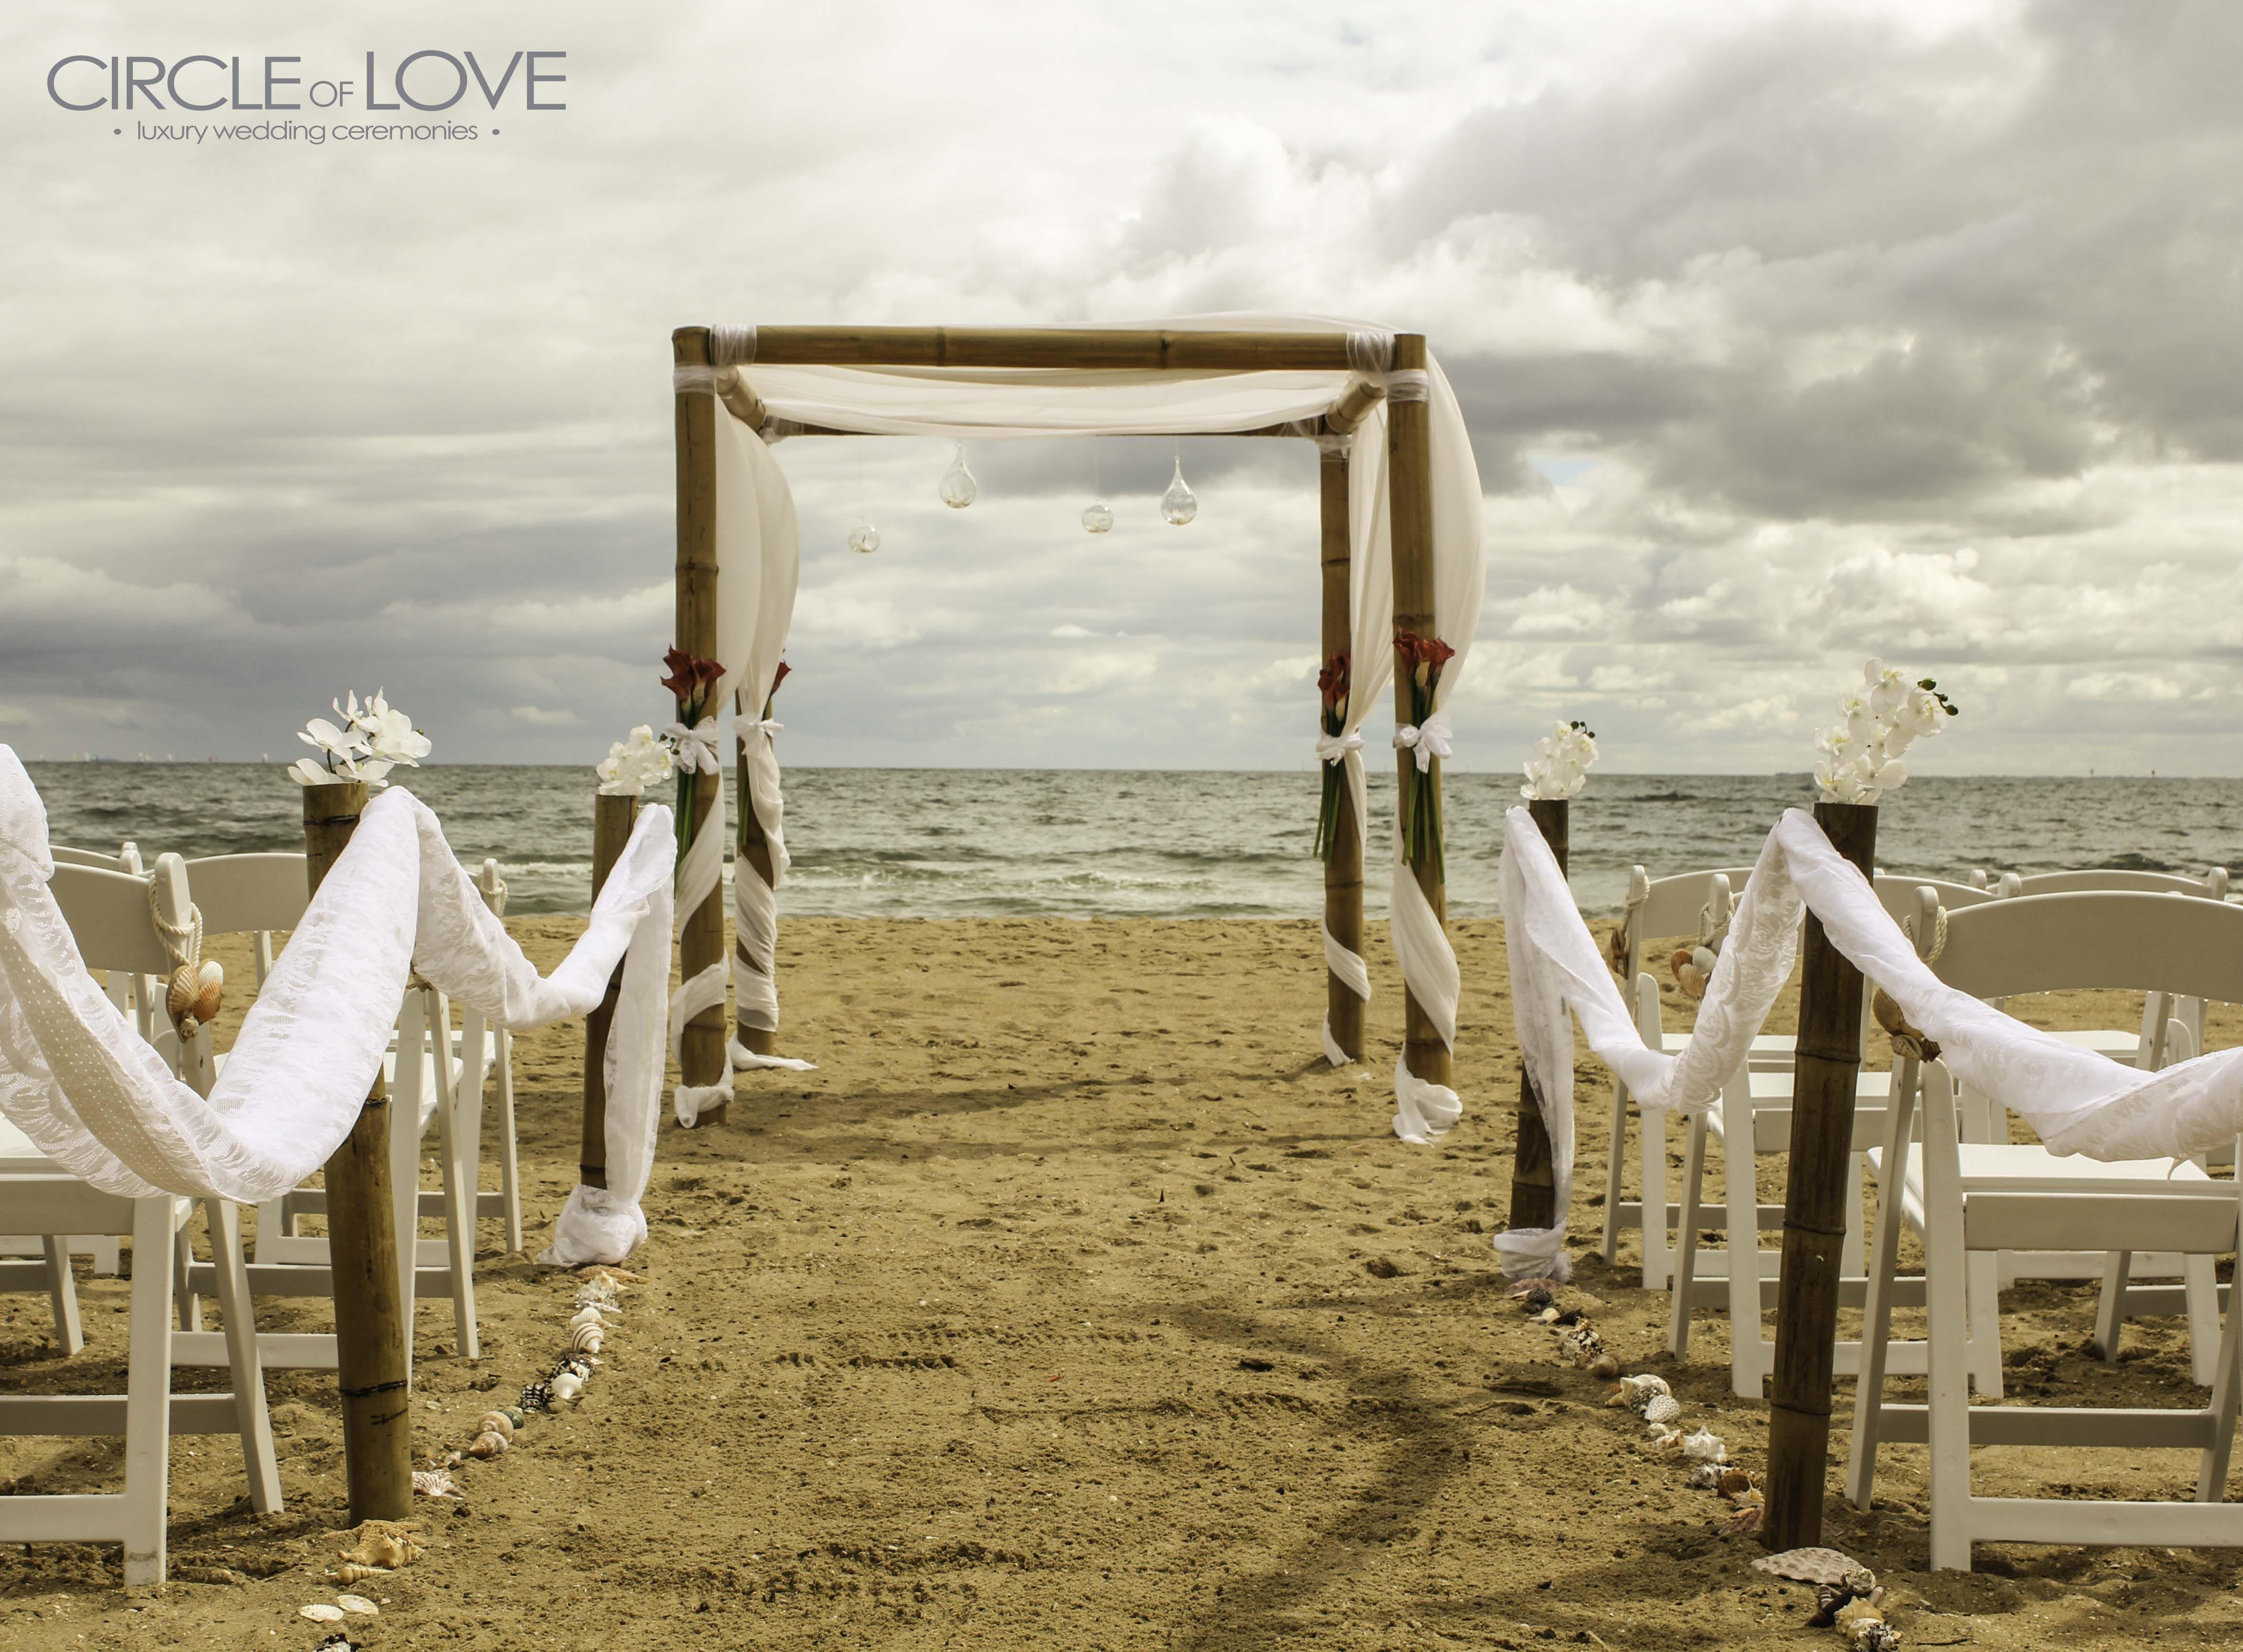 St Kilda Beach Wedding Venue Circleofloveweddingsau